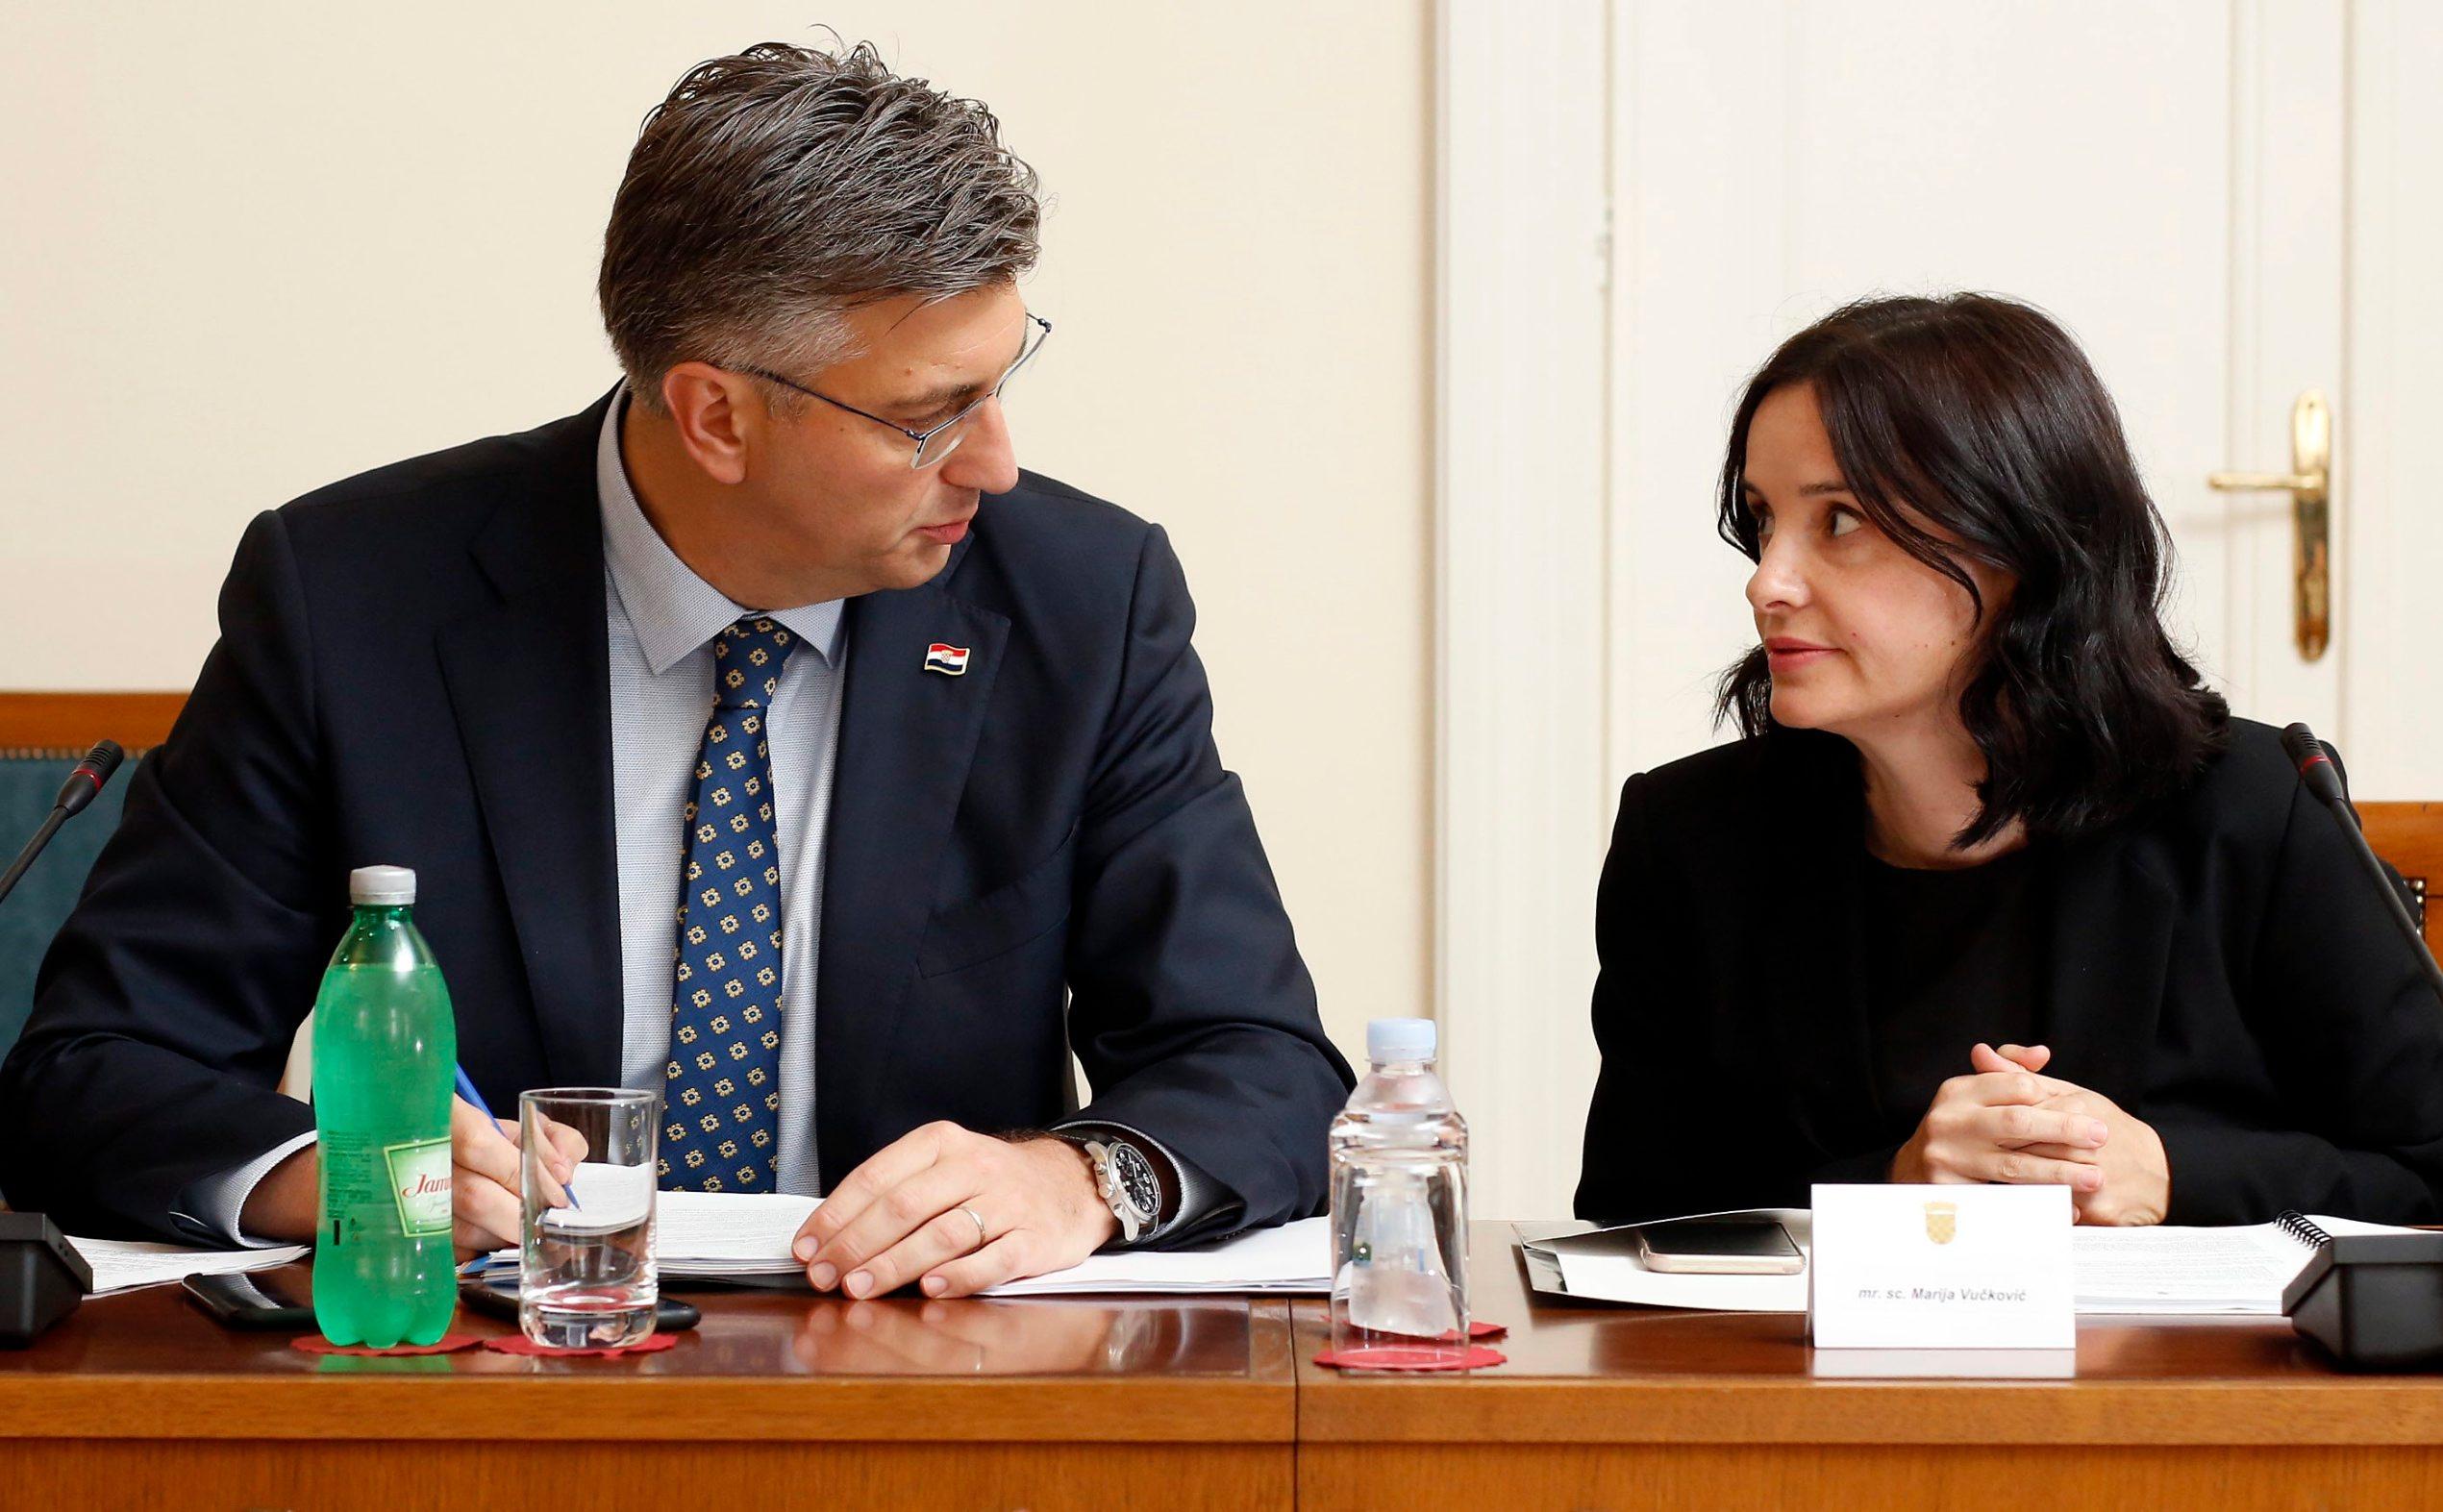 Prime Minister Andrej Plenković and Agriculture Minister Marija Vučković